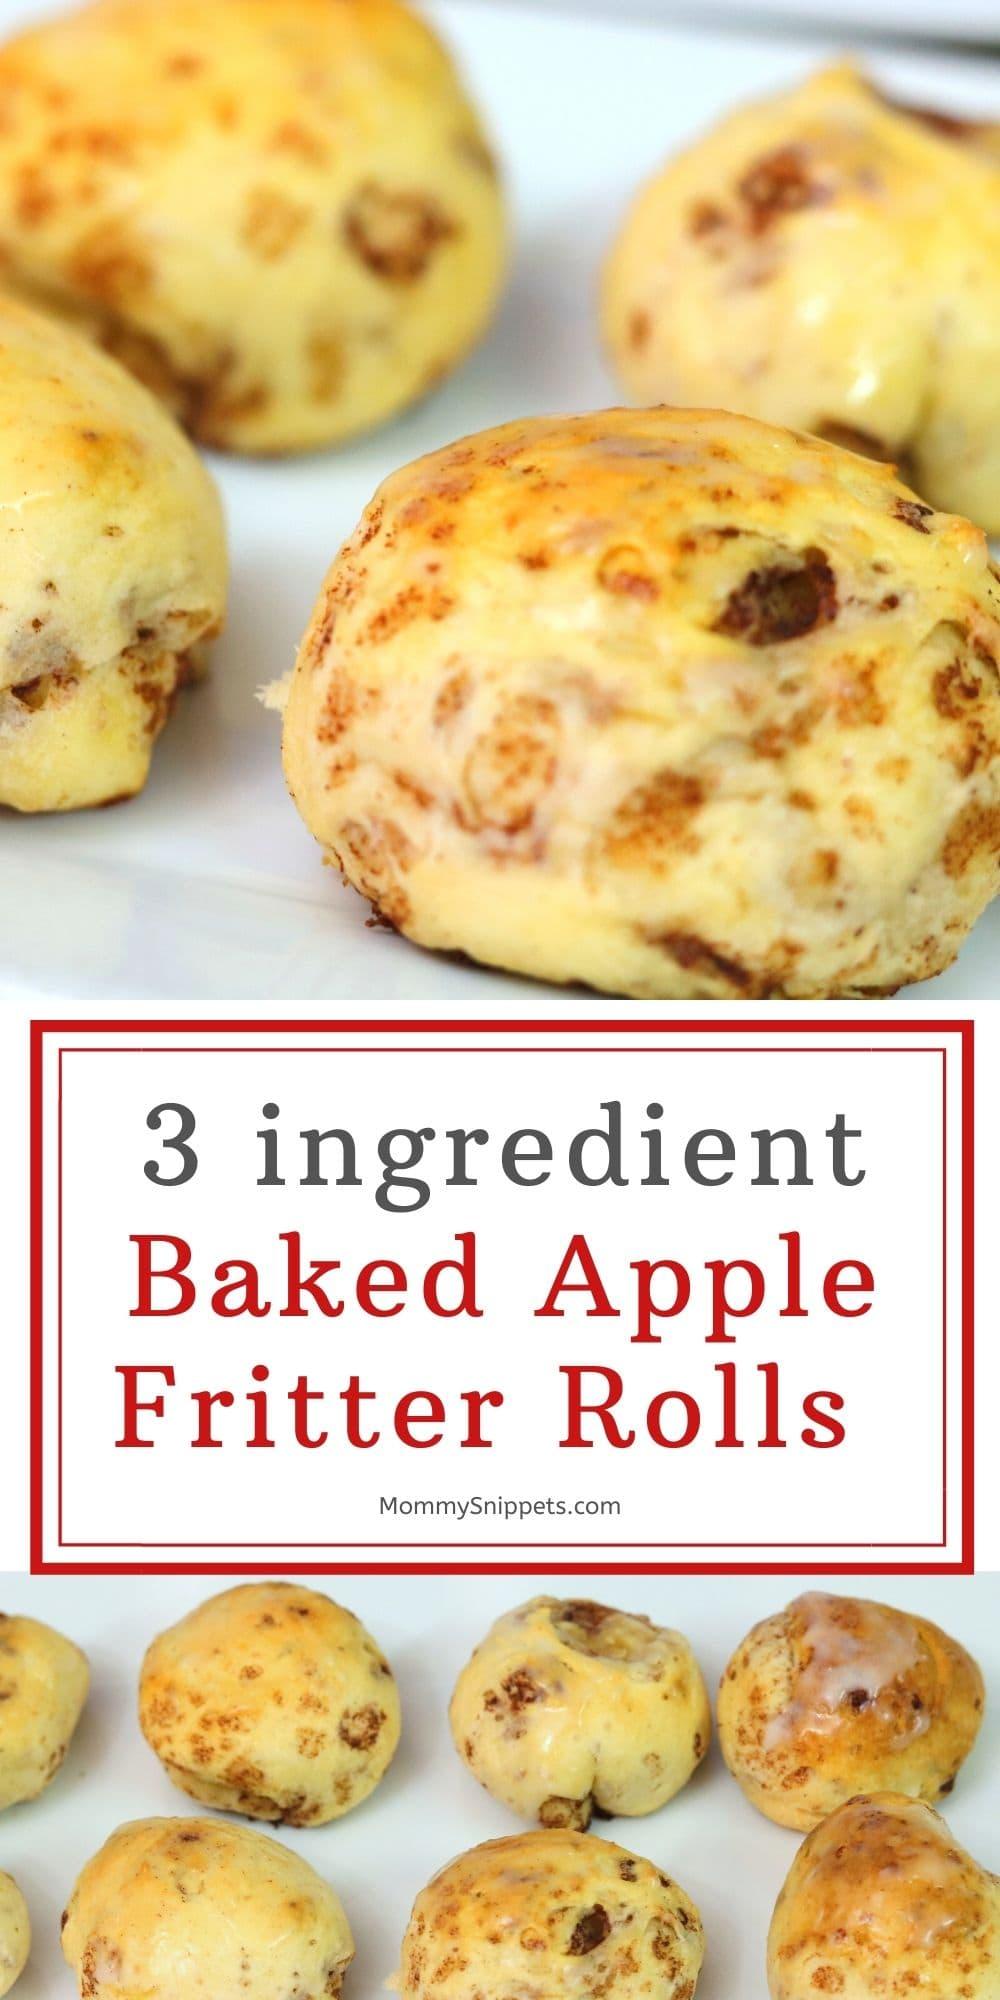 The best 3 ingredient baked apple fritter rolls recipe